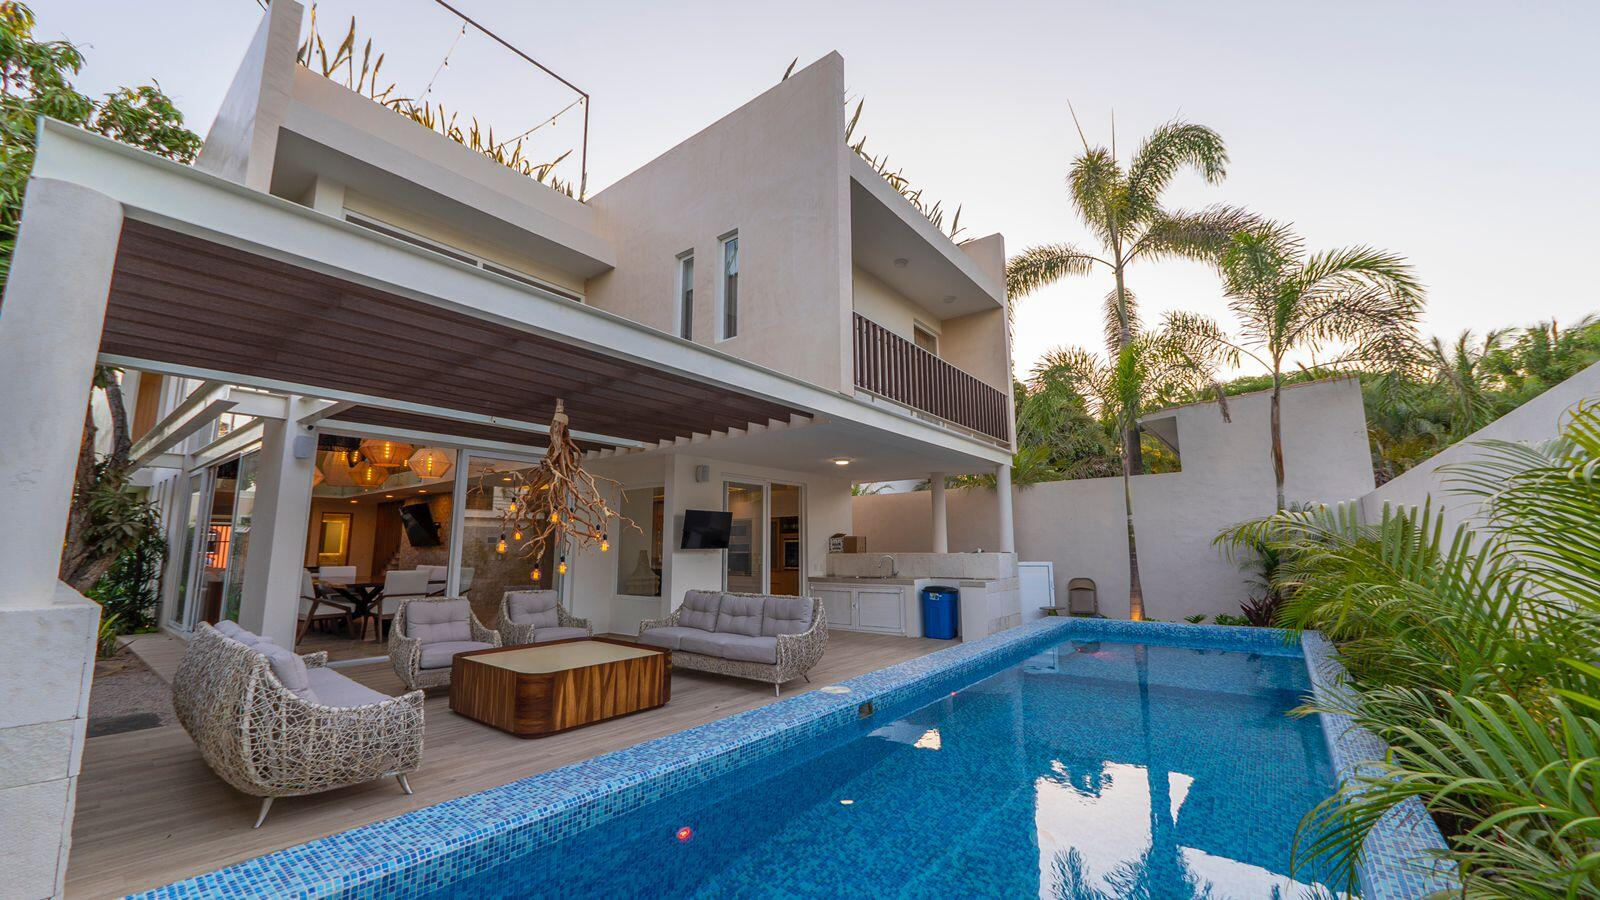 Bucerias, 5 Bedrooms Bedrooms, ,6.5 BathroomsBathrooms,House,For Sale,Mangos,21955